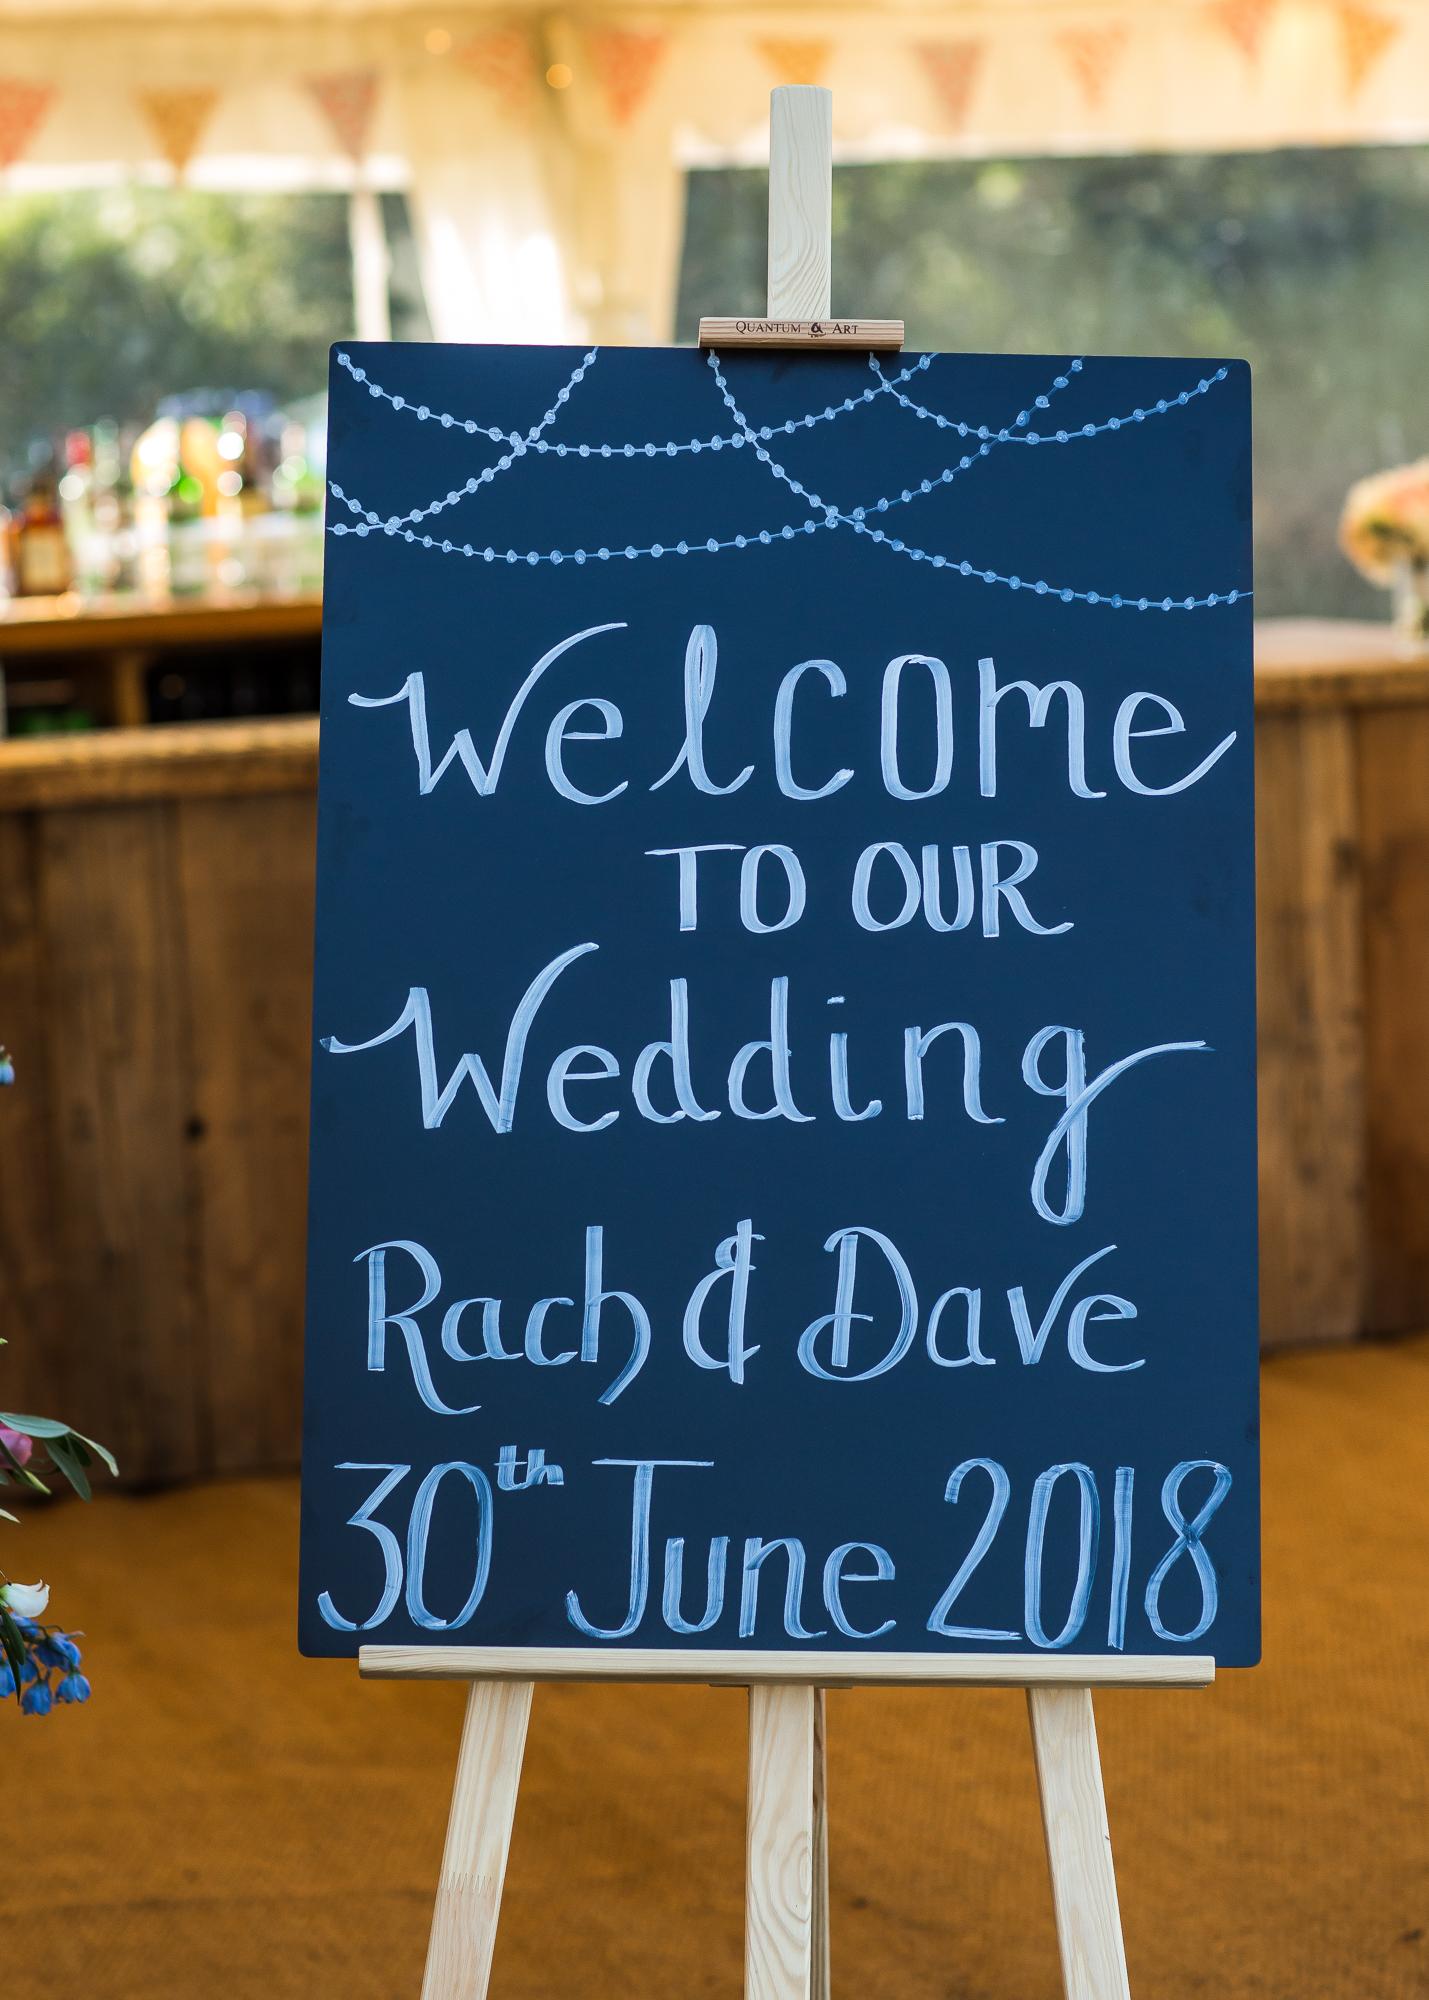 2018-06-30 Rachael & Dave 325 blog.jpg